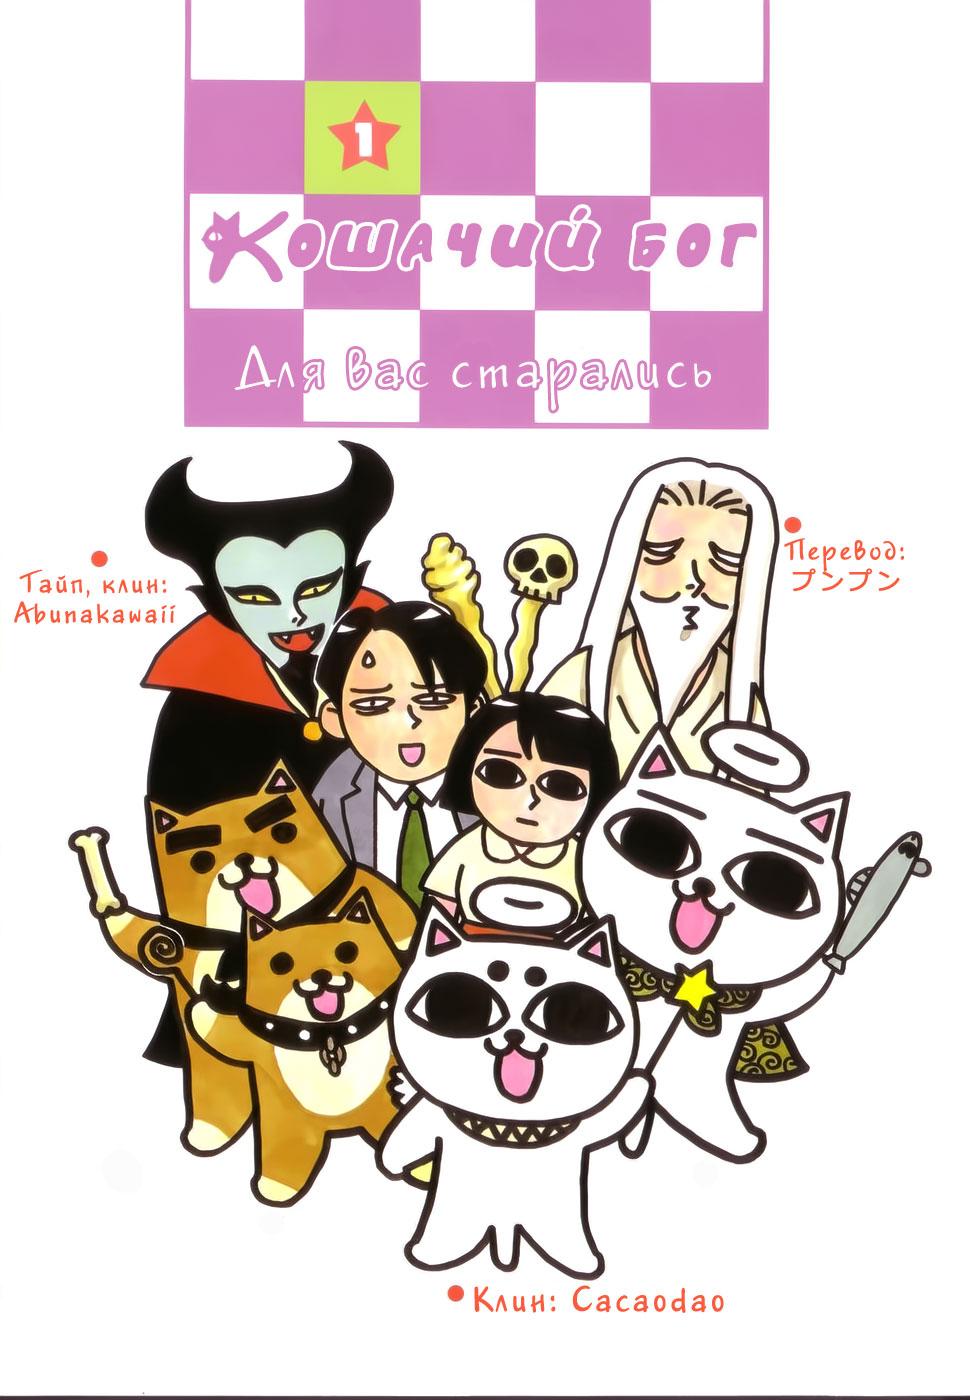 https://r1.ninemanga.com/comics/pic2/43/34923/654111/153872587447.jpg Page 2